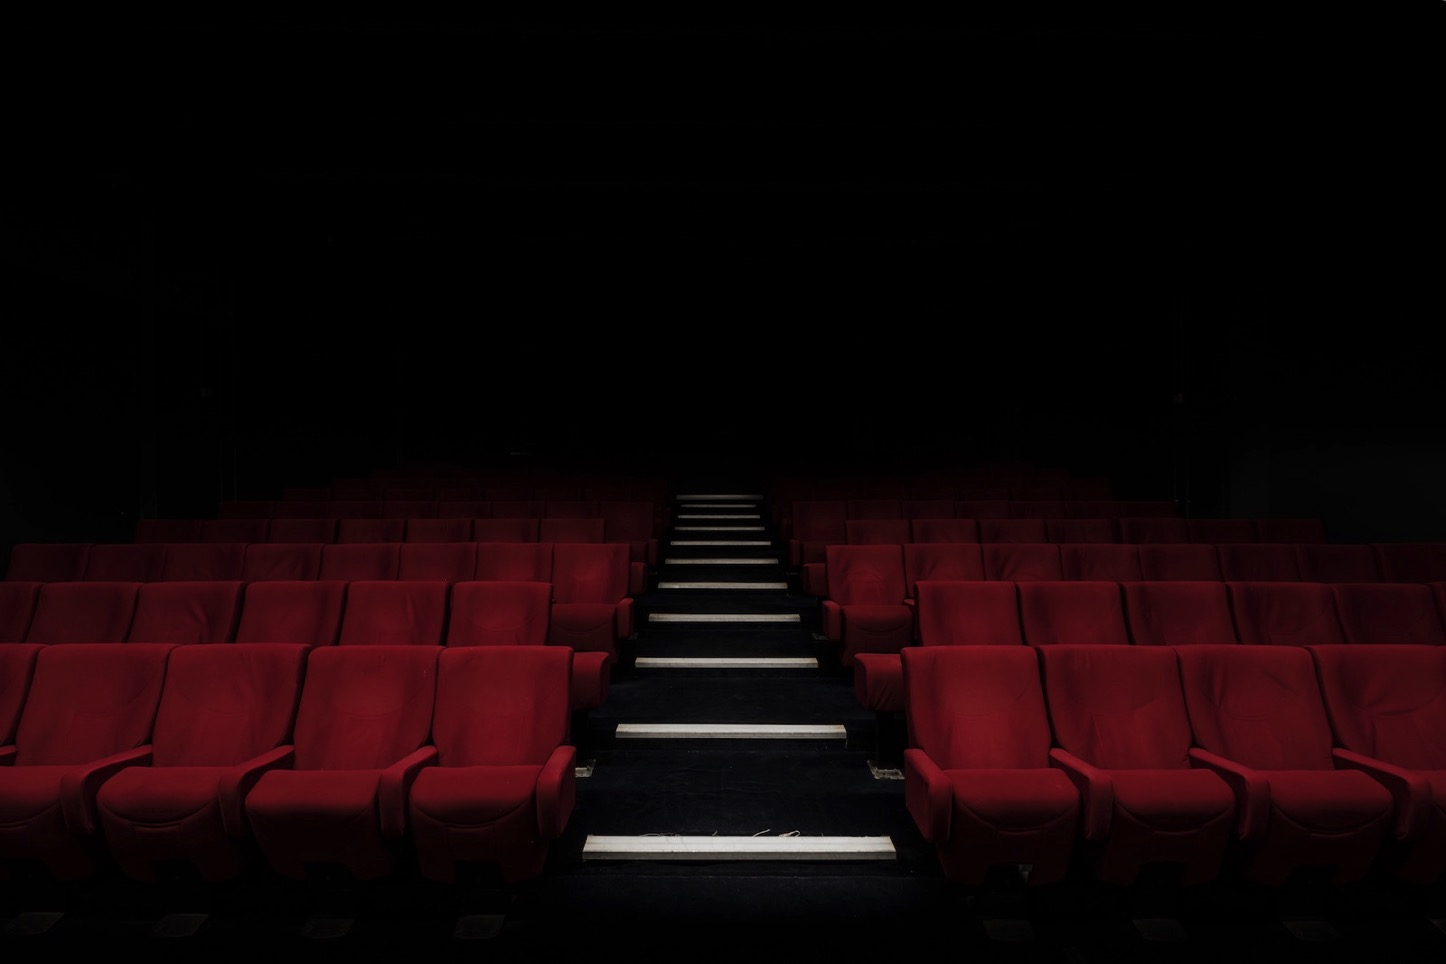 felix-mooneeram-222805-movie-theater-unsplash.jpg